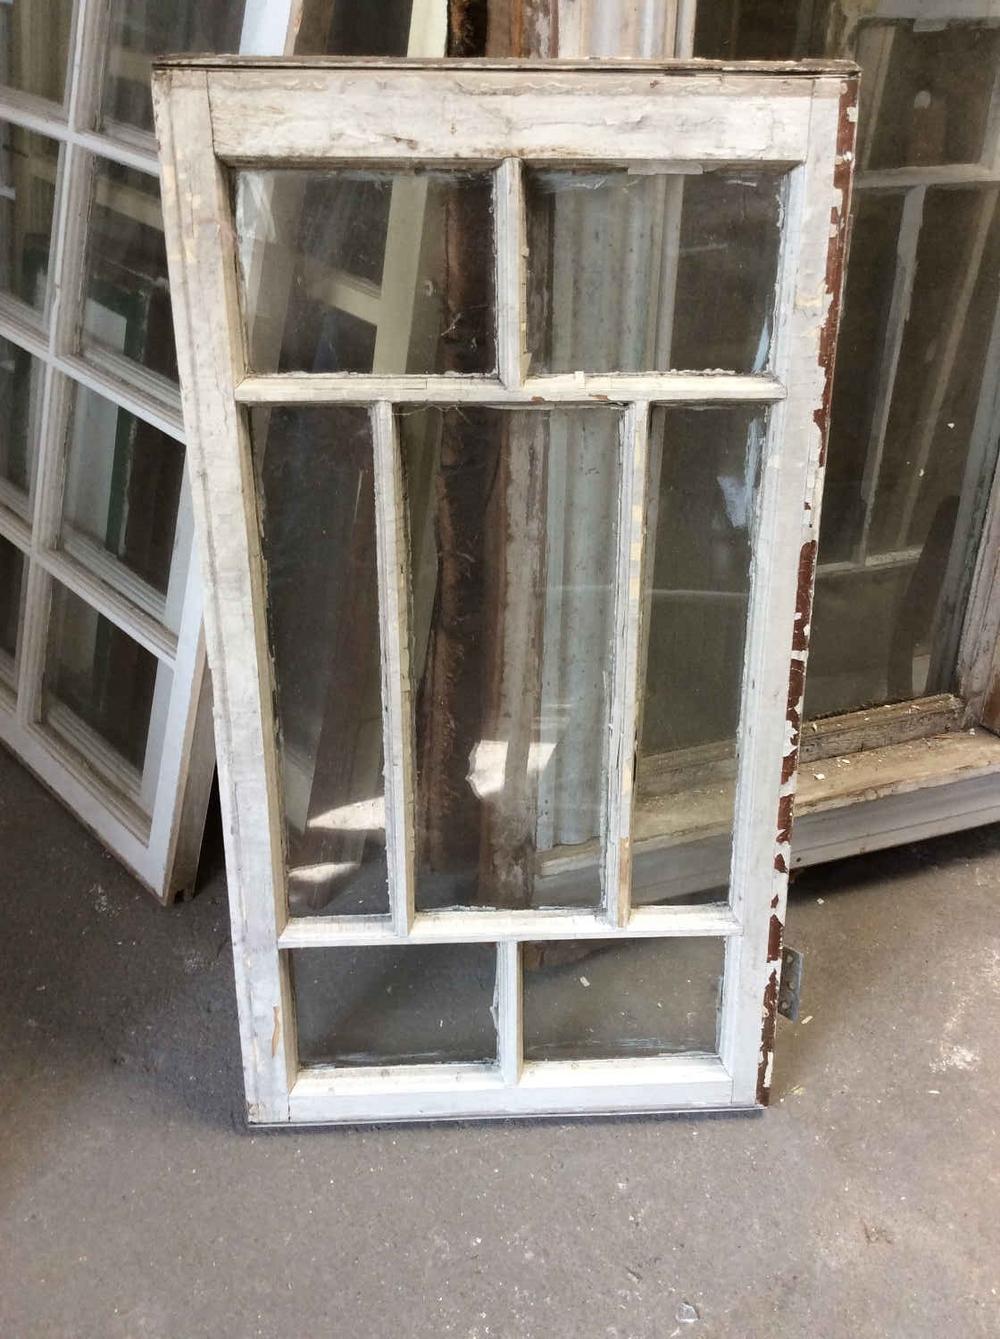 cottage style window sash ekenasfiber johnhenriksson se u2022 rh ekenasfiber johnhenriksson se